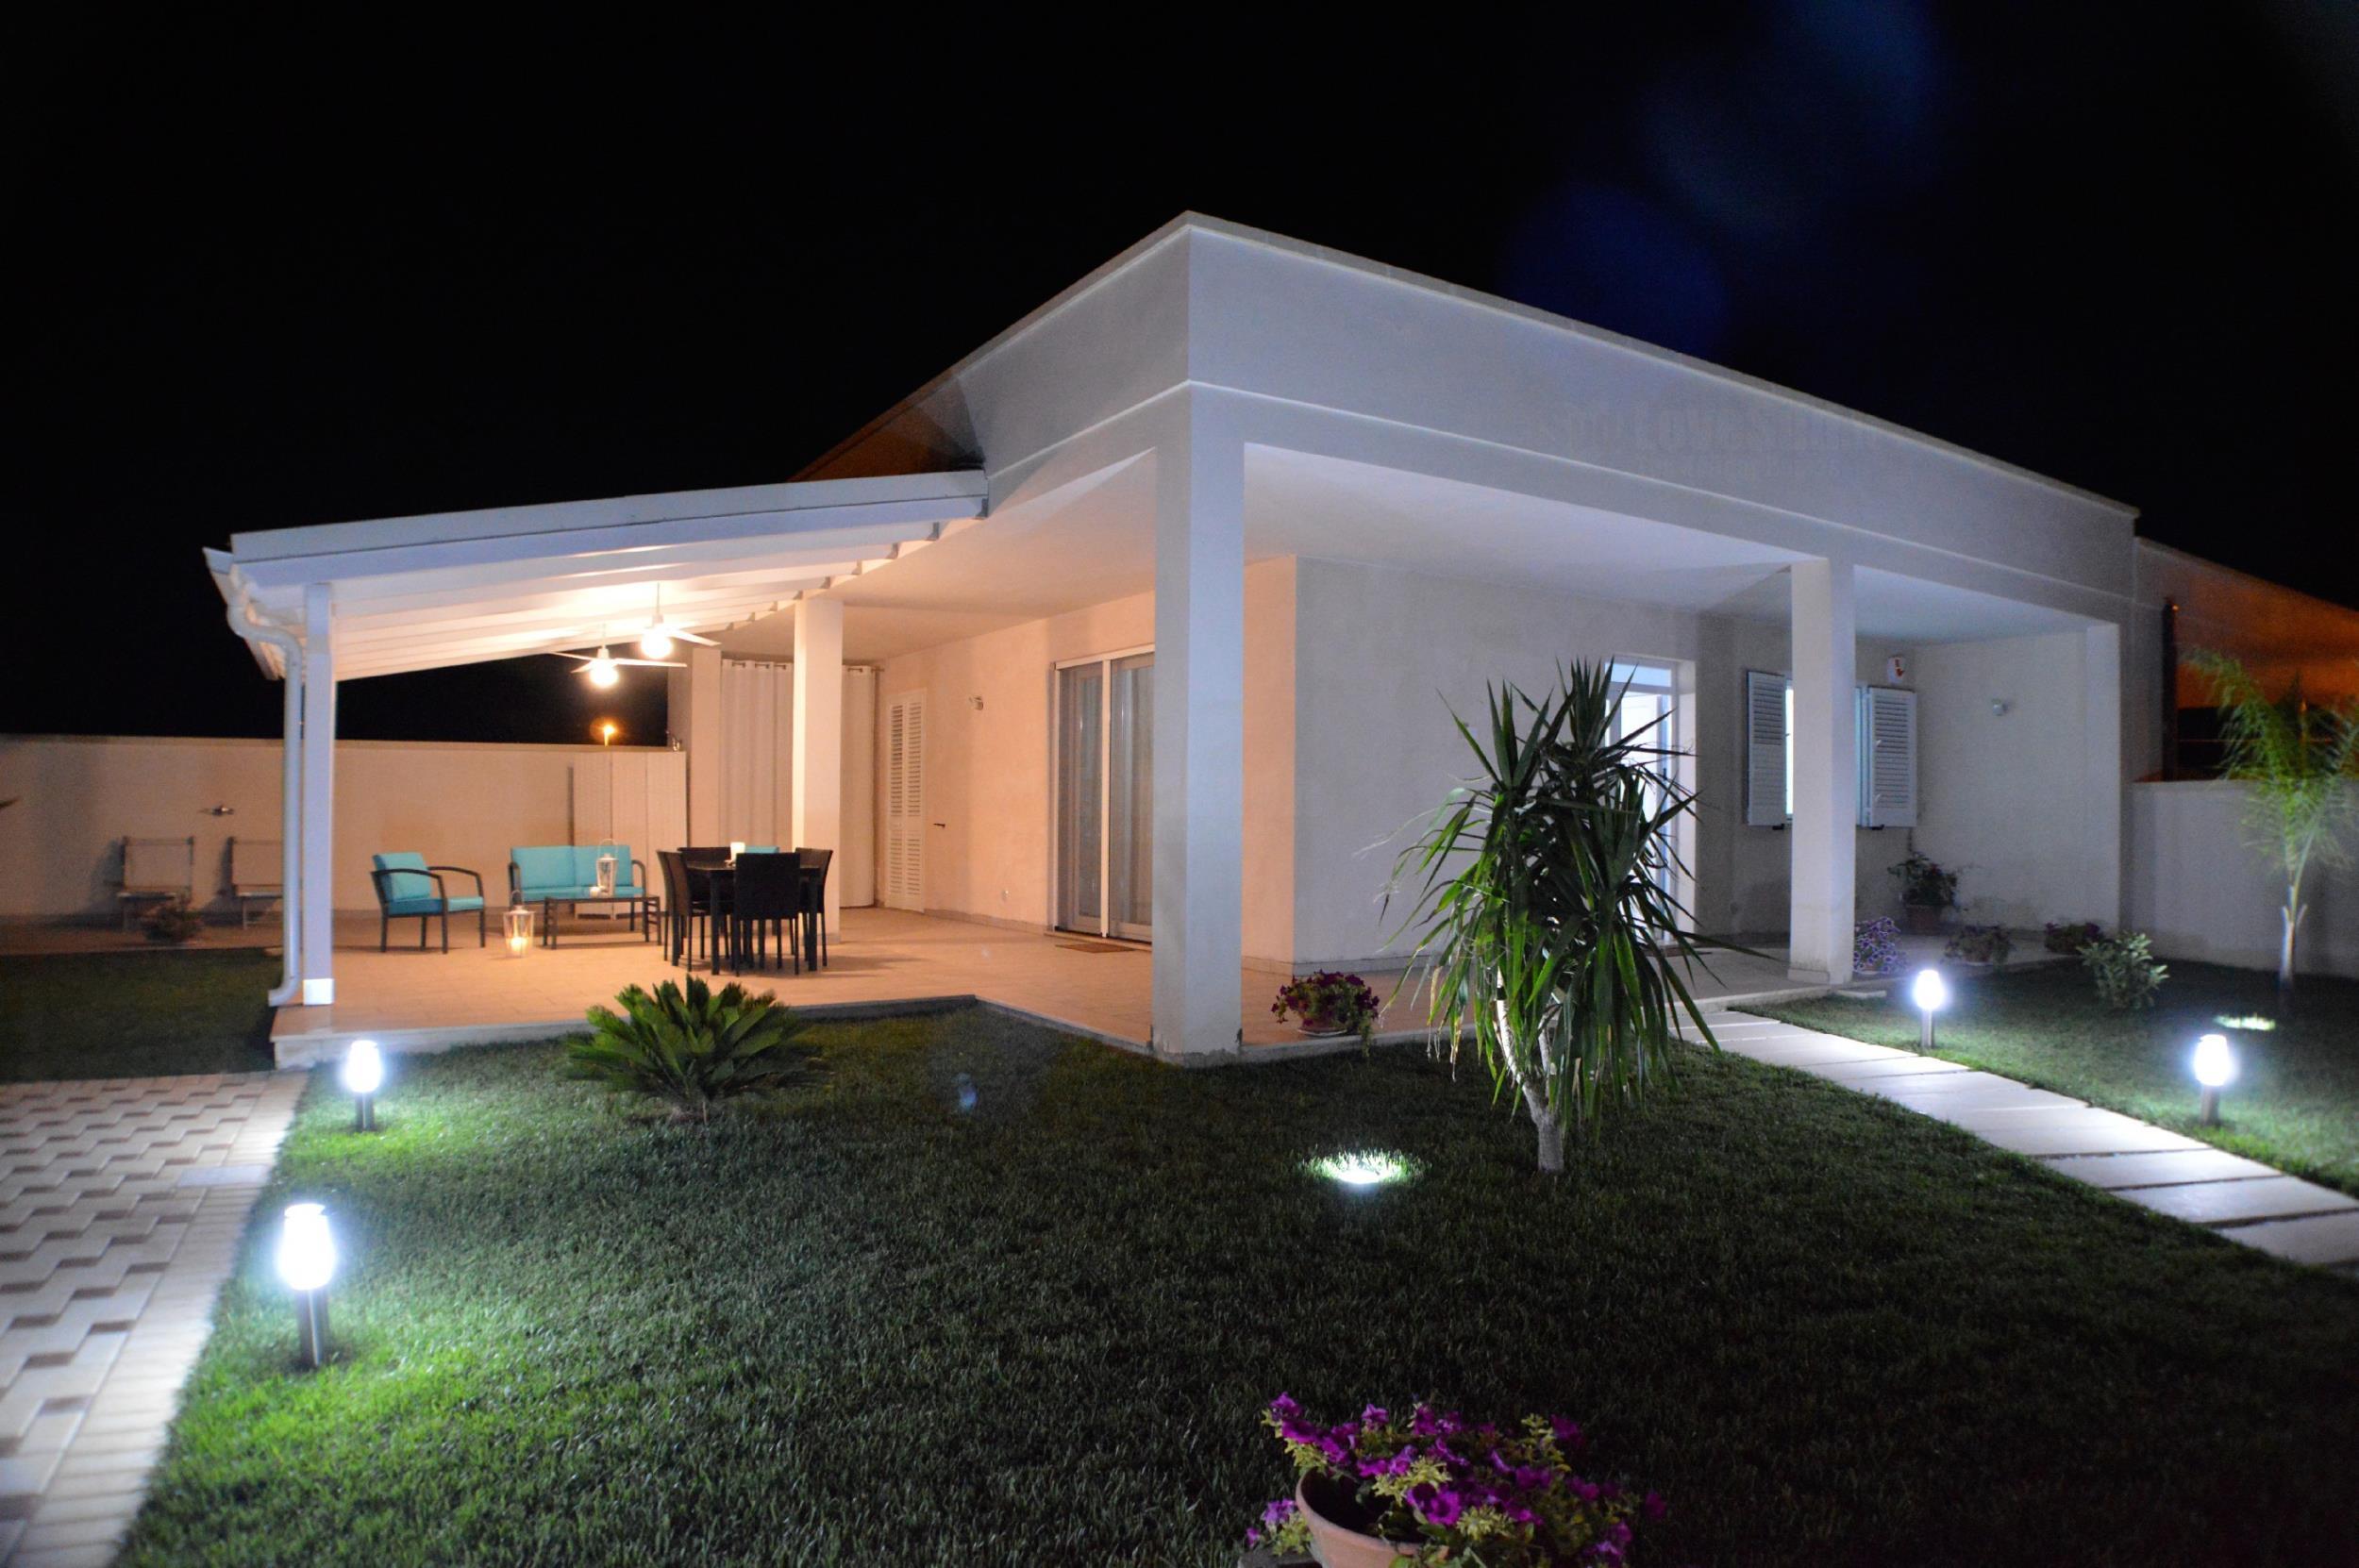 Apartment Elcisia luxe beach house photo 23457094